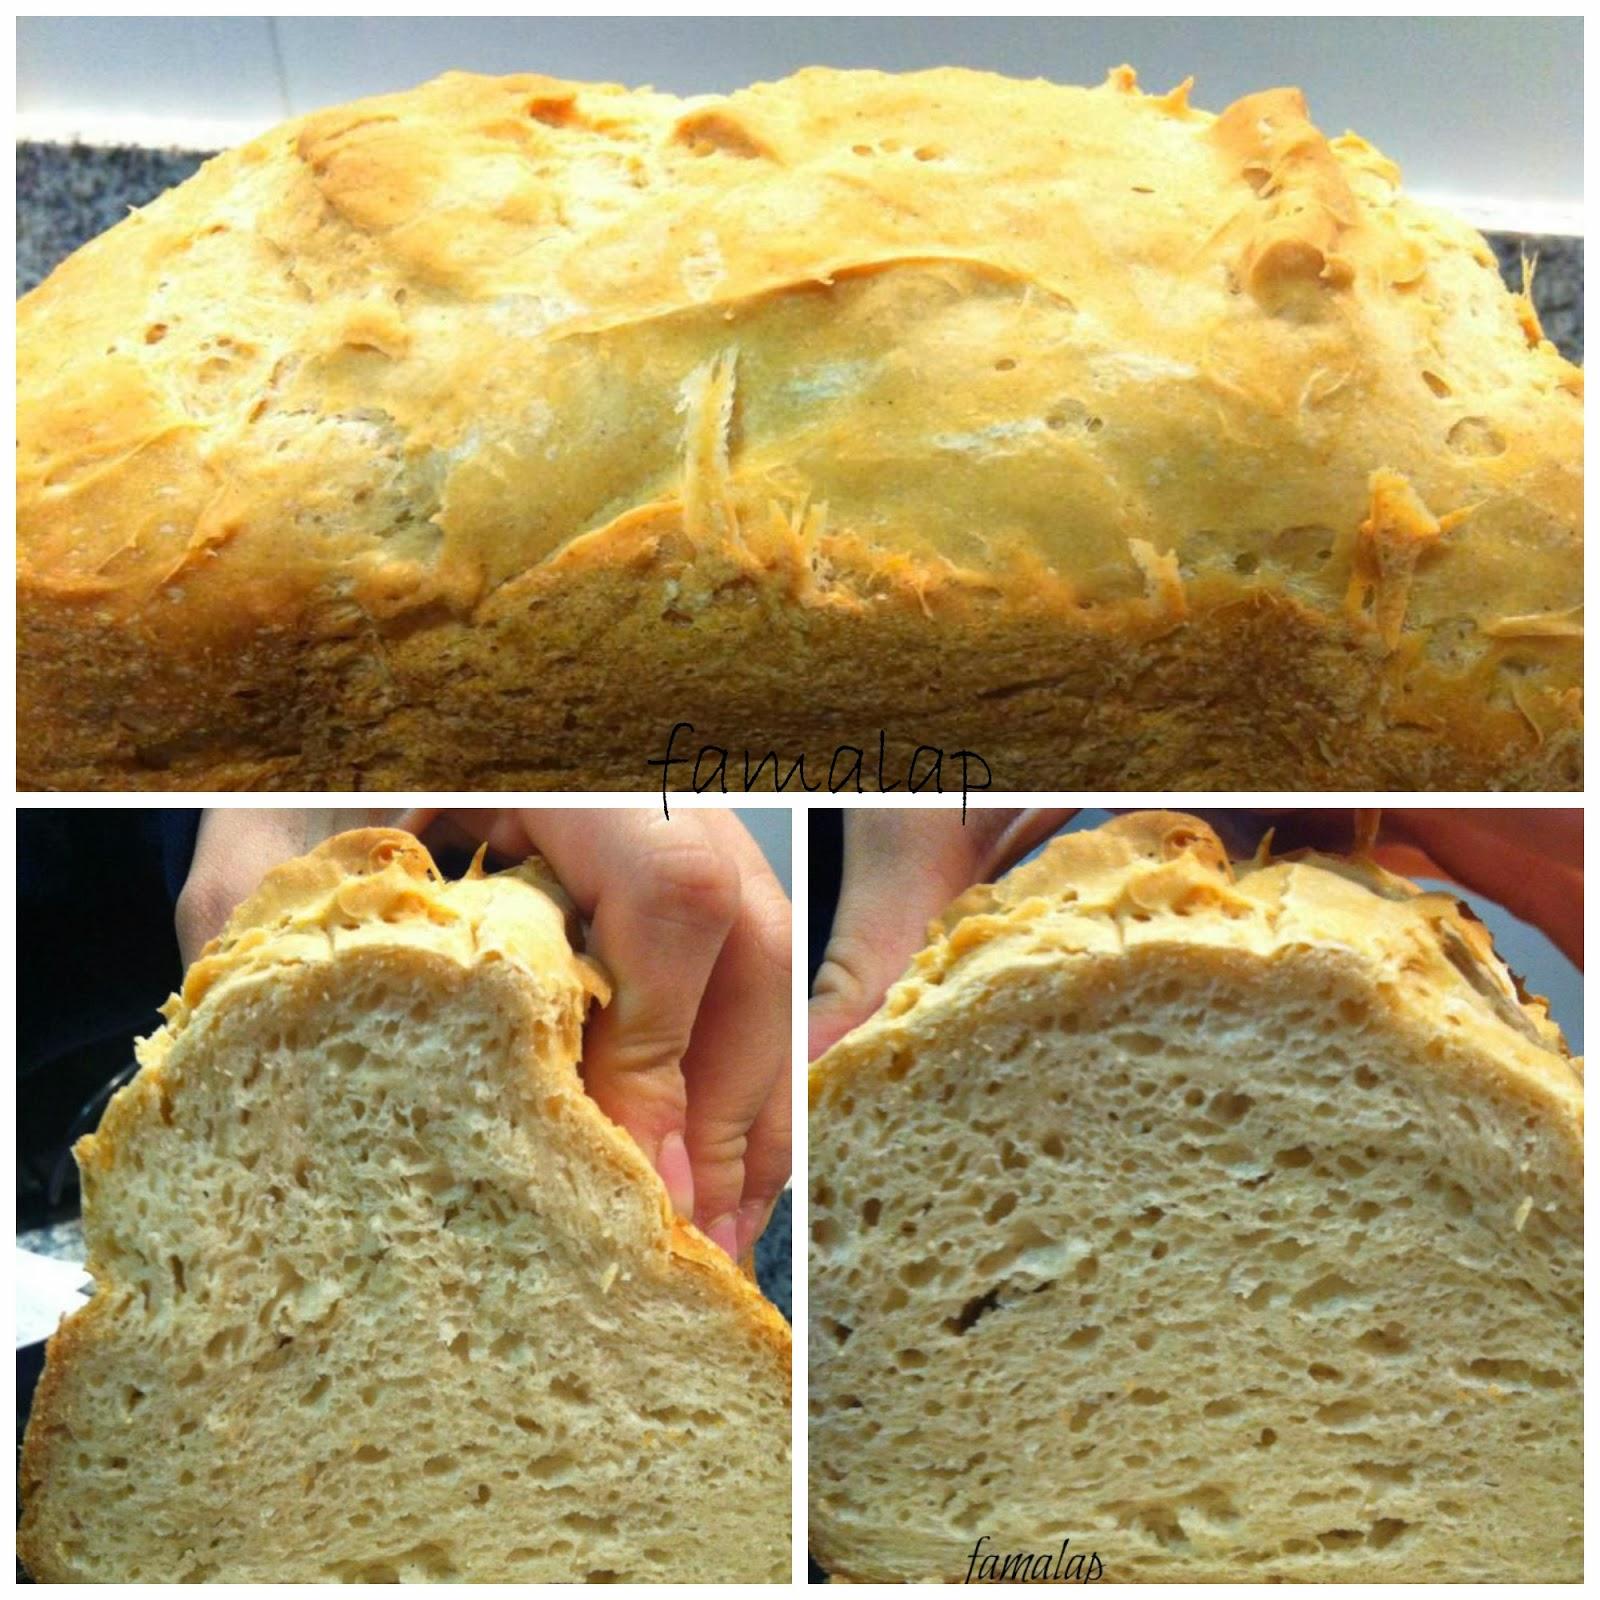 Cocina f cil sin gluten taller quiero hacer pan - Cocina facil sin gluten ...